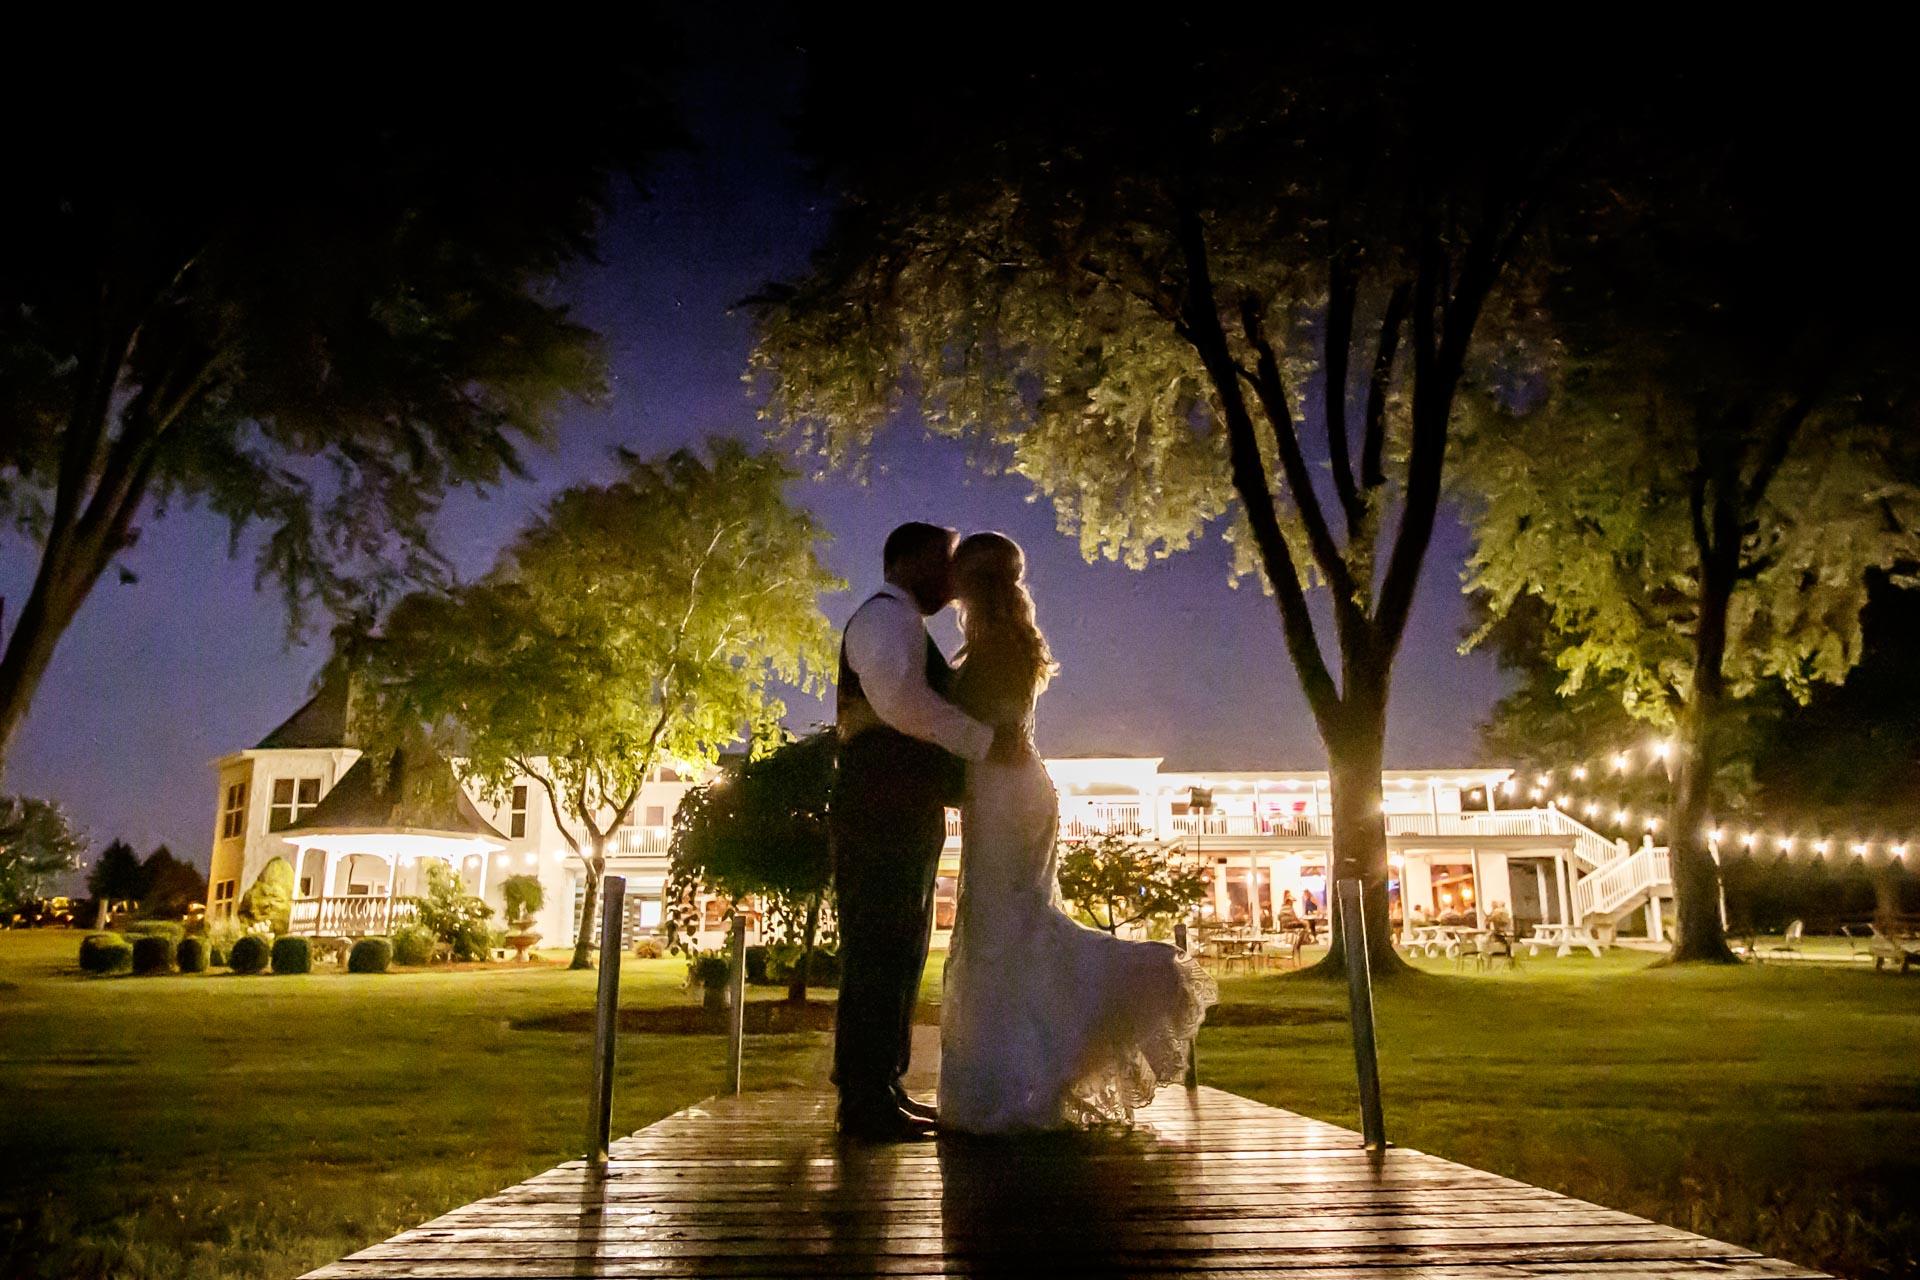 aud-mar-banquet-hall-muskego-wi-adam-shea-photography-green-bay-appleton-neenah-photographer-85.jpg